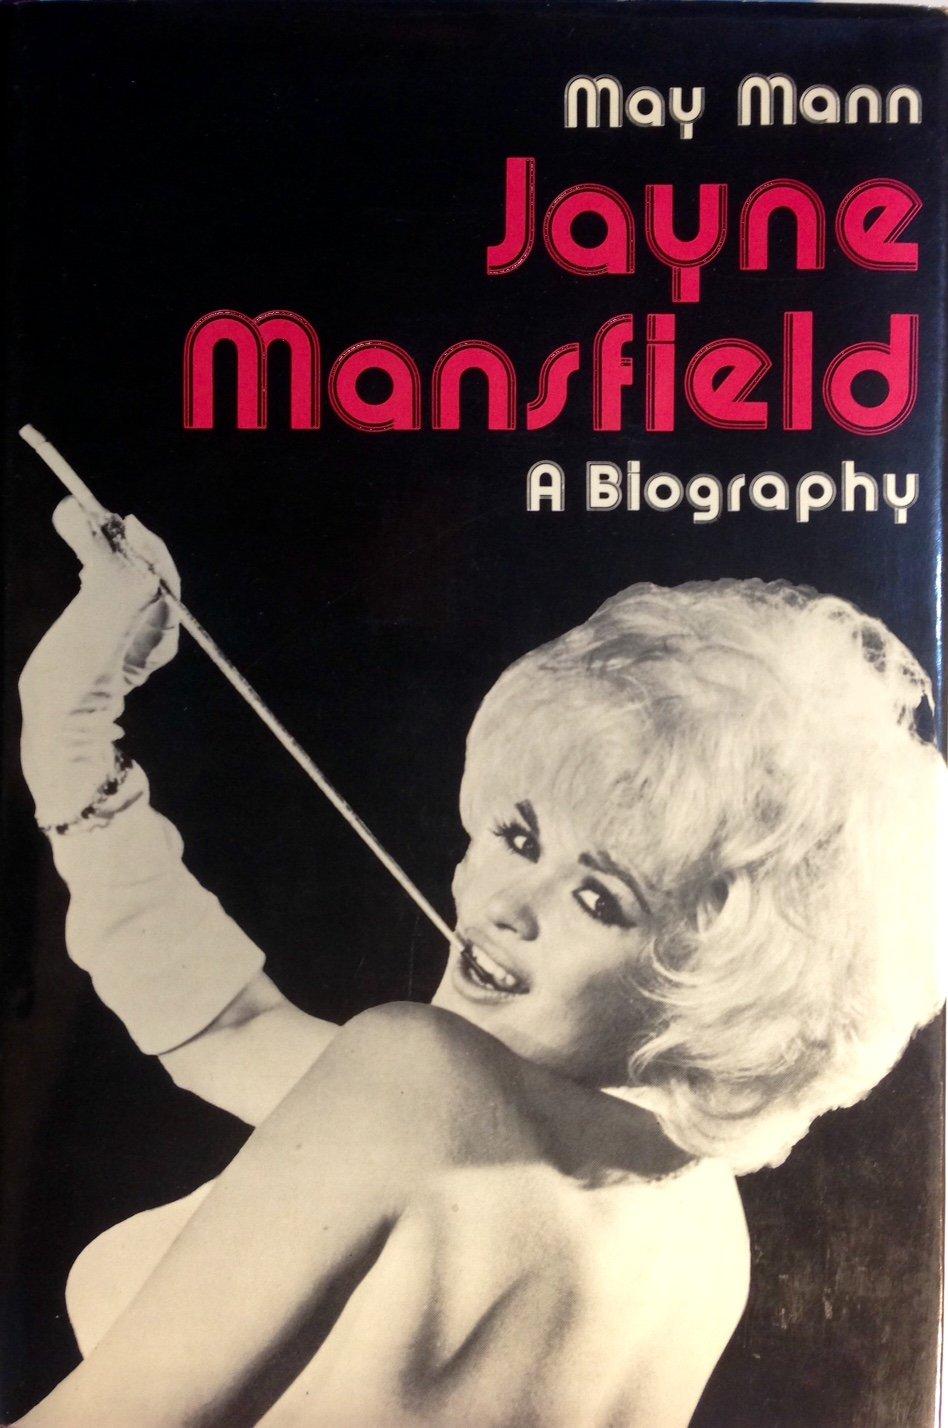 Jayne Mansfield;: A biography: May Mann: 9780877494157: Amazon.com ...